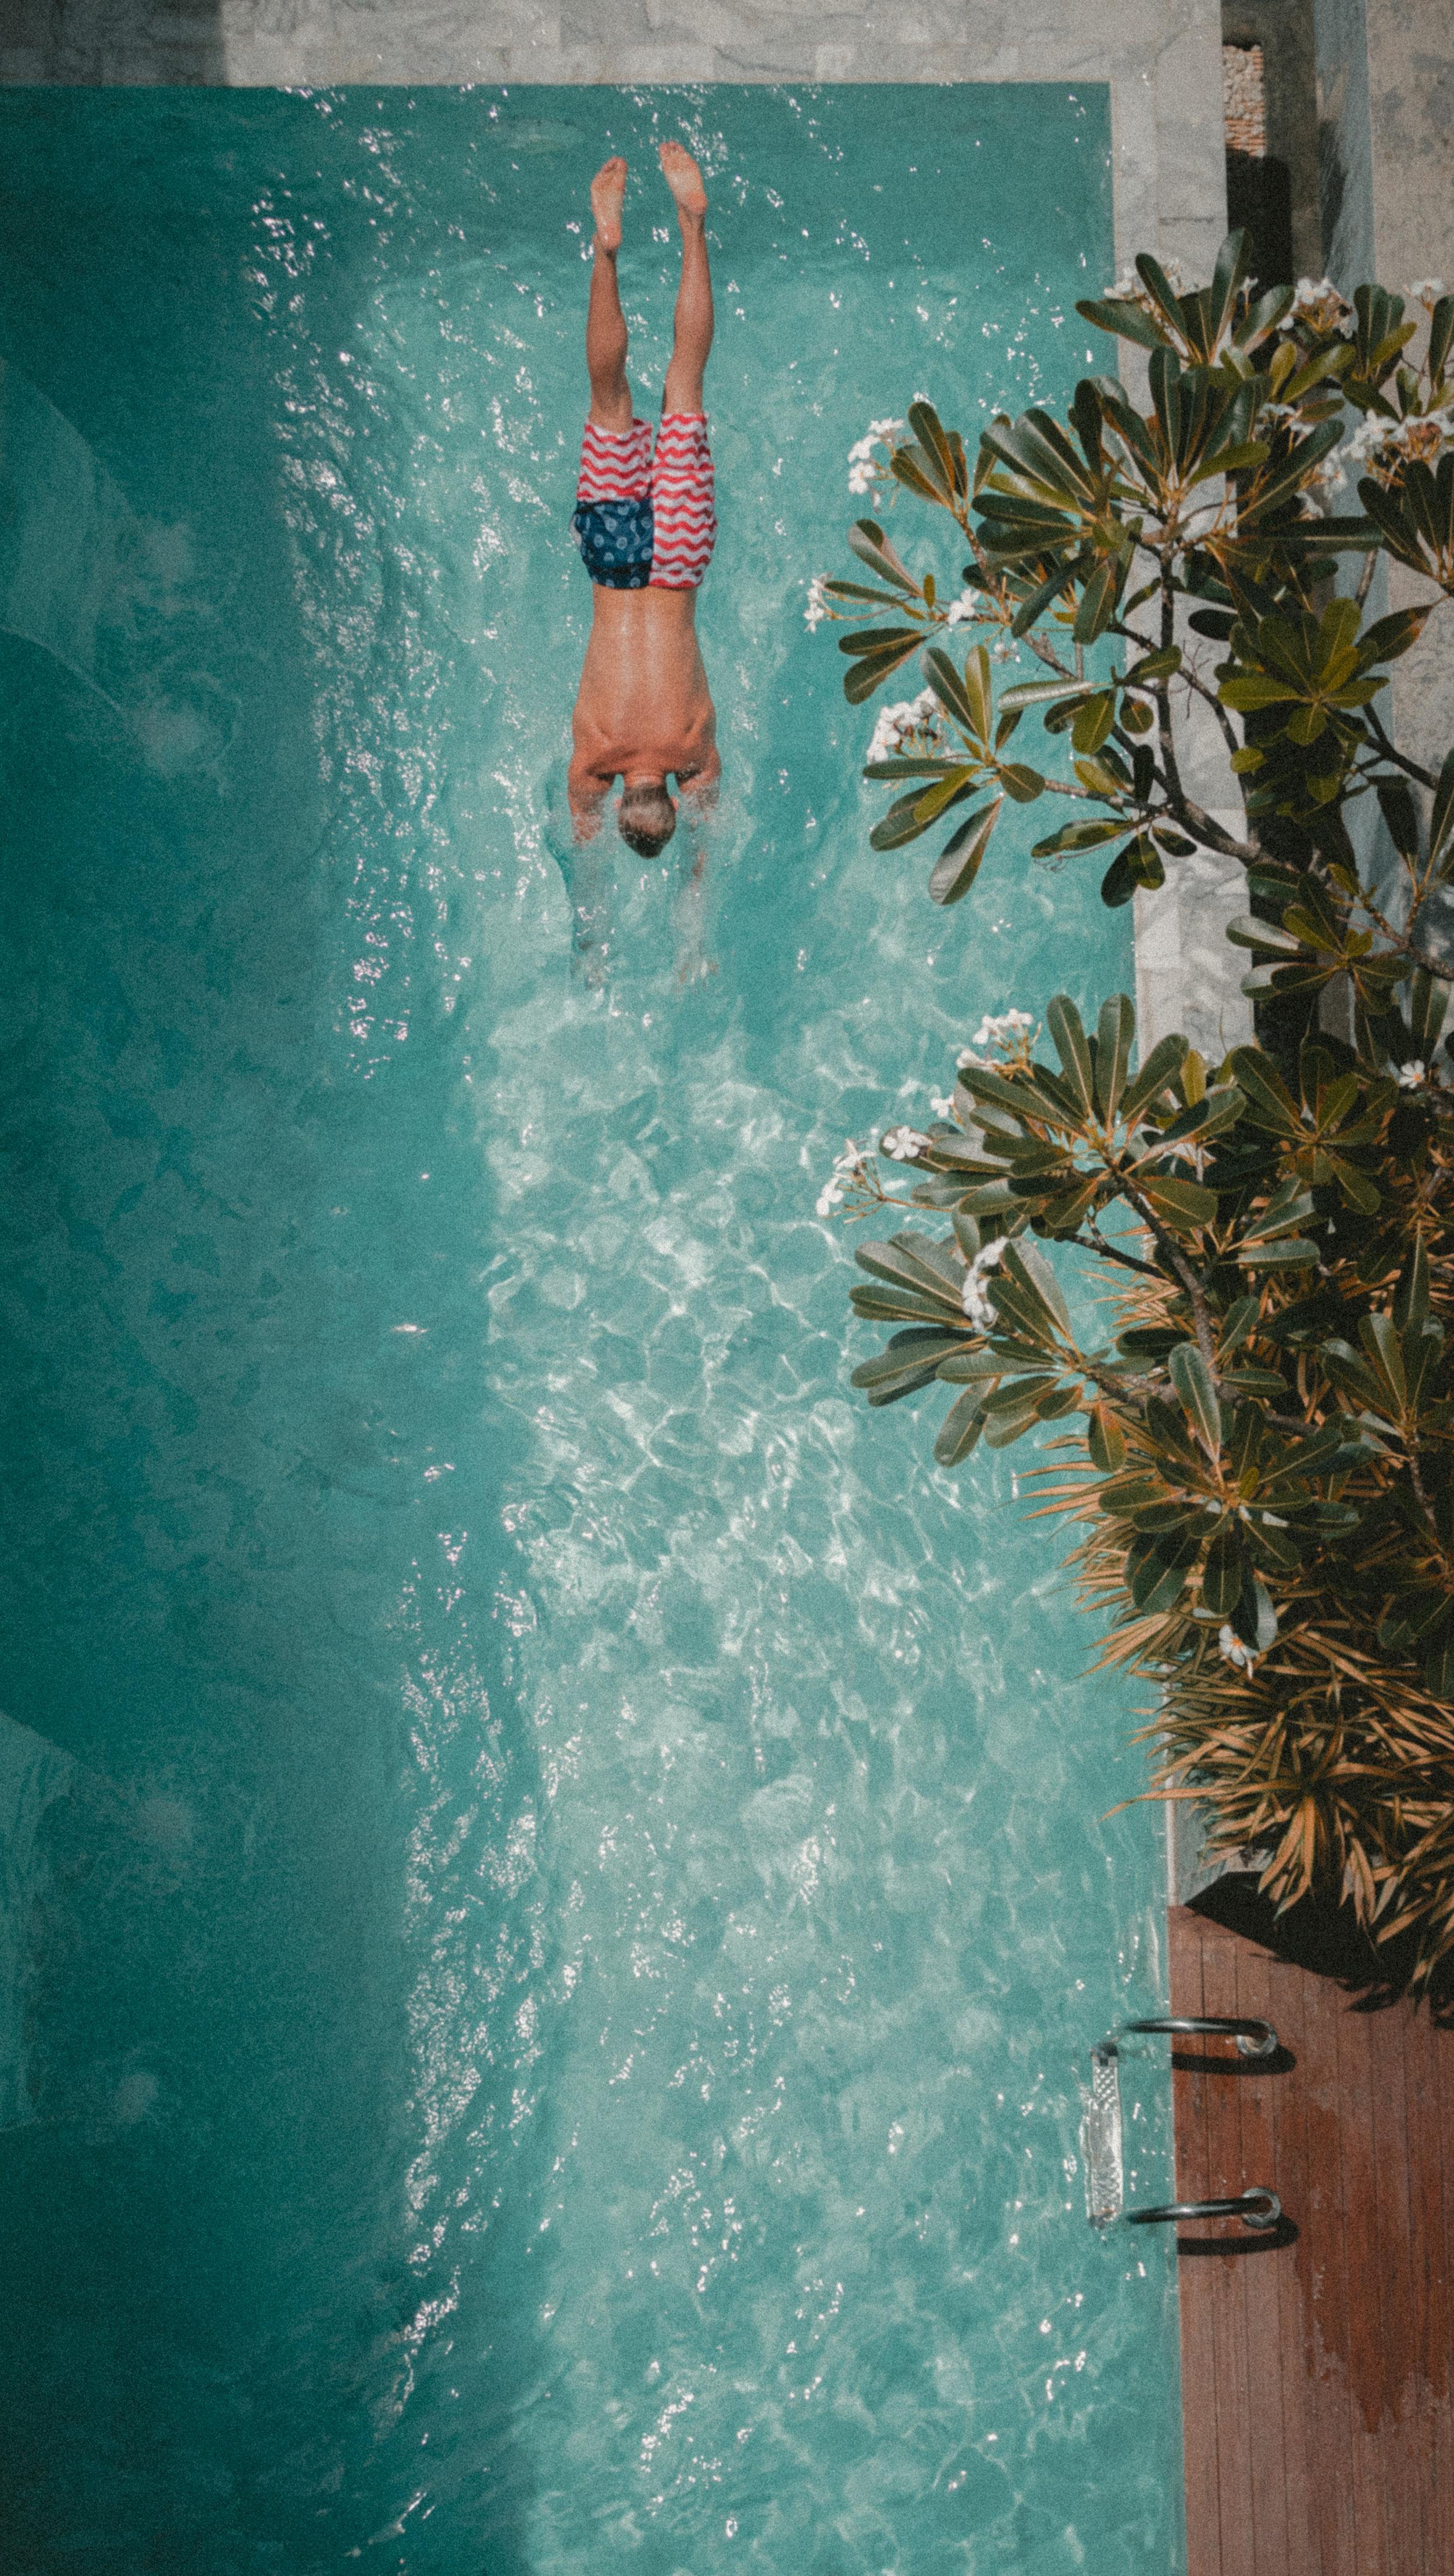 in-ground-pool-myrtle-beach